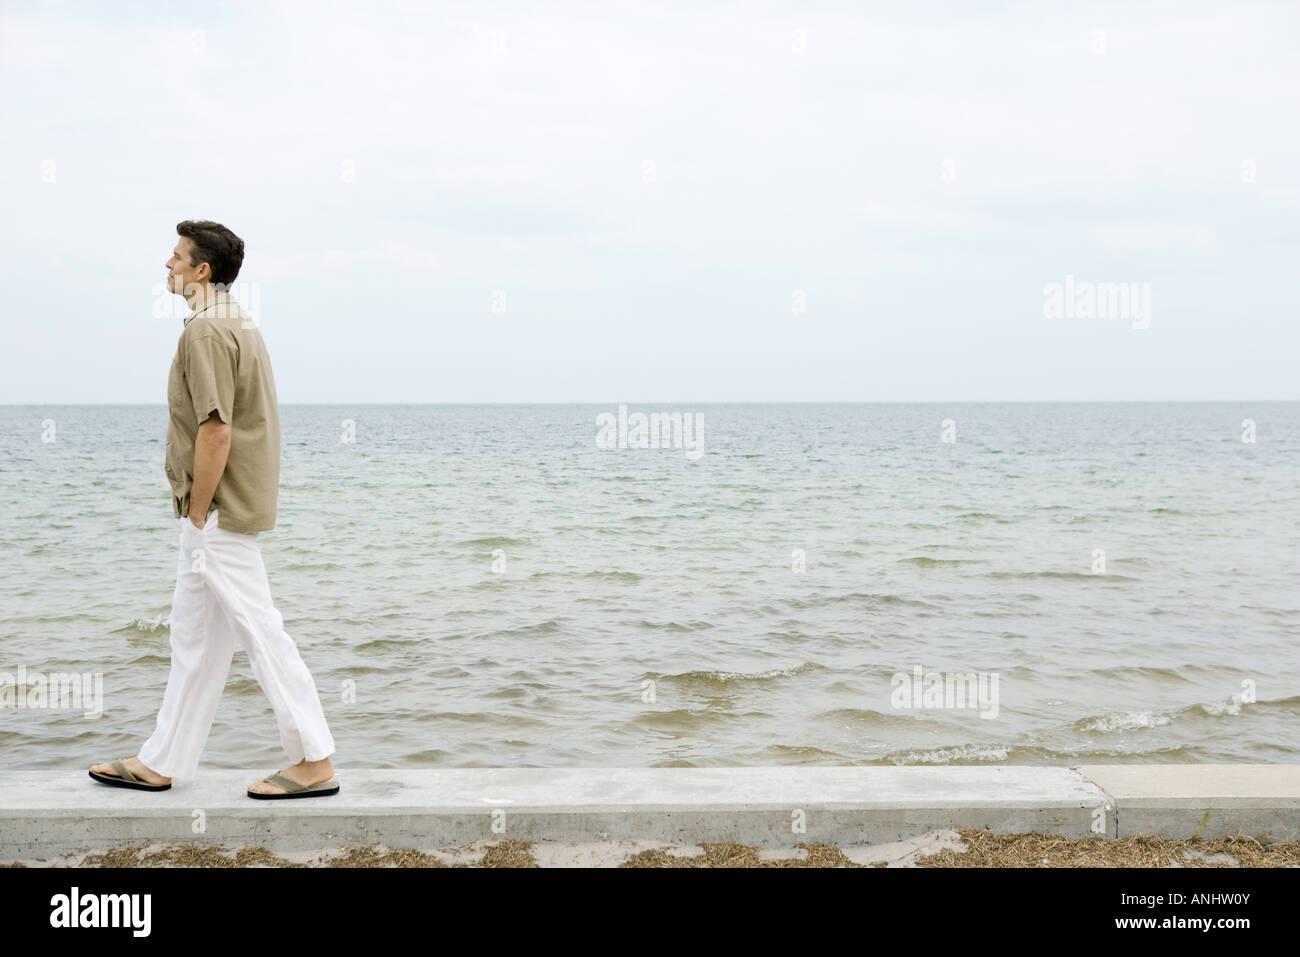 Man walking along low wall by ocean, hands in pockets, full length - Stock Image